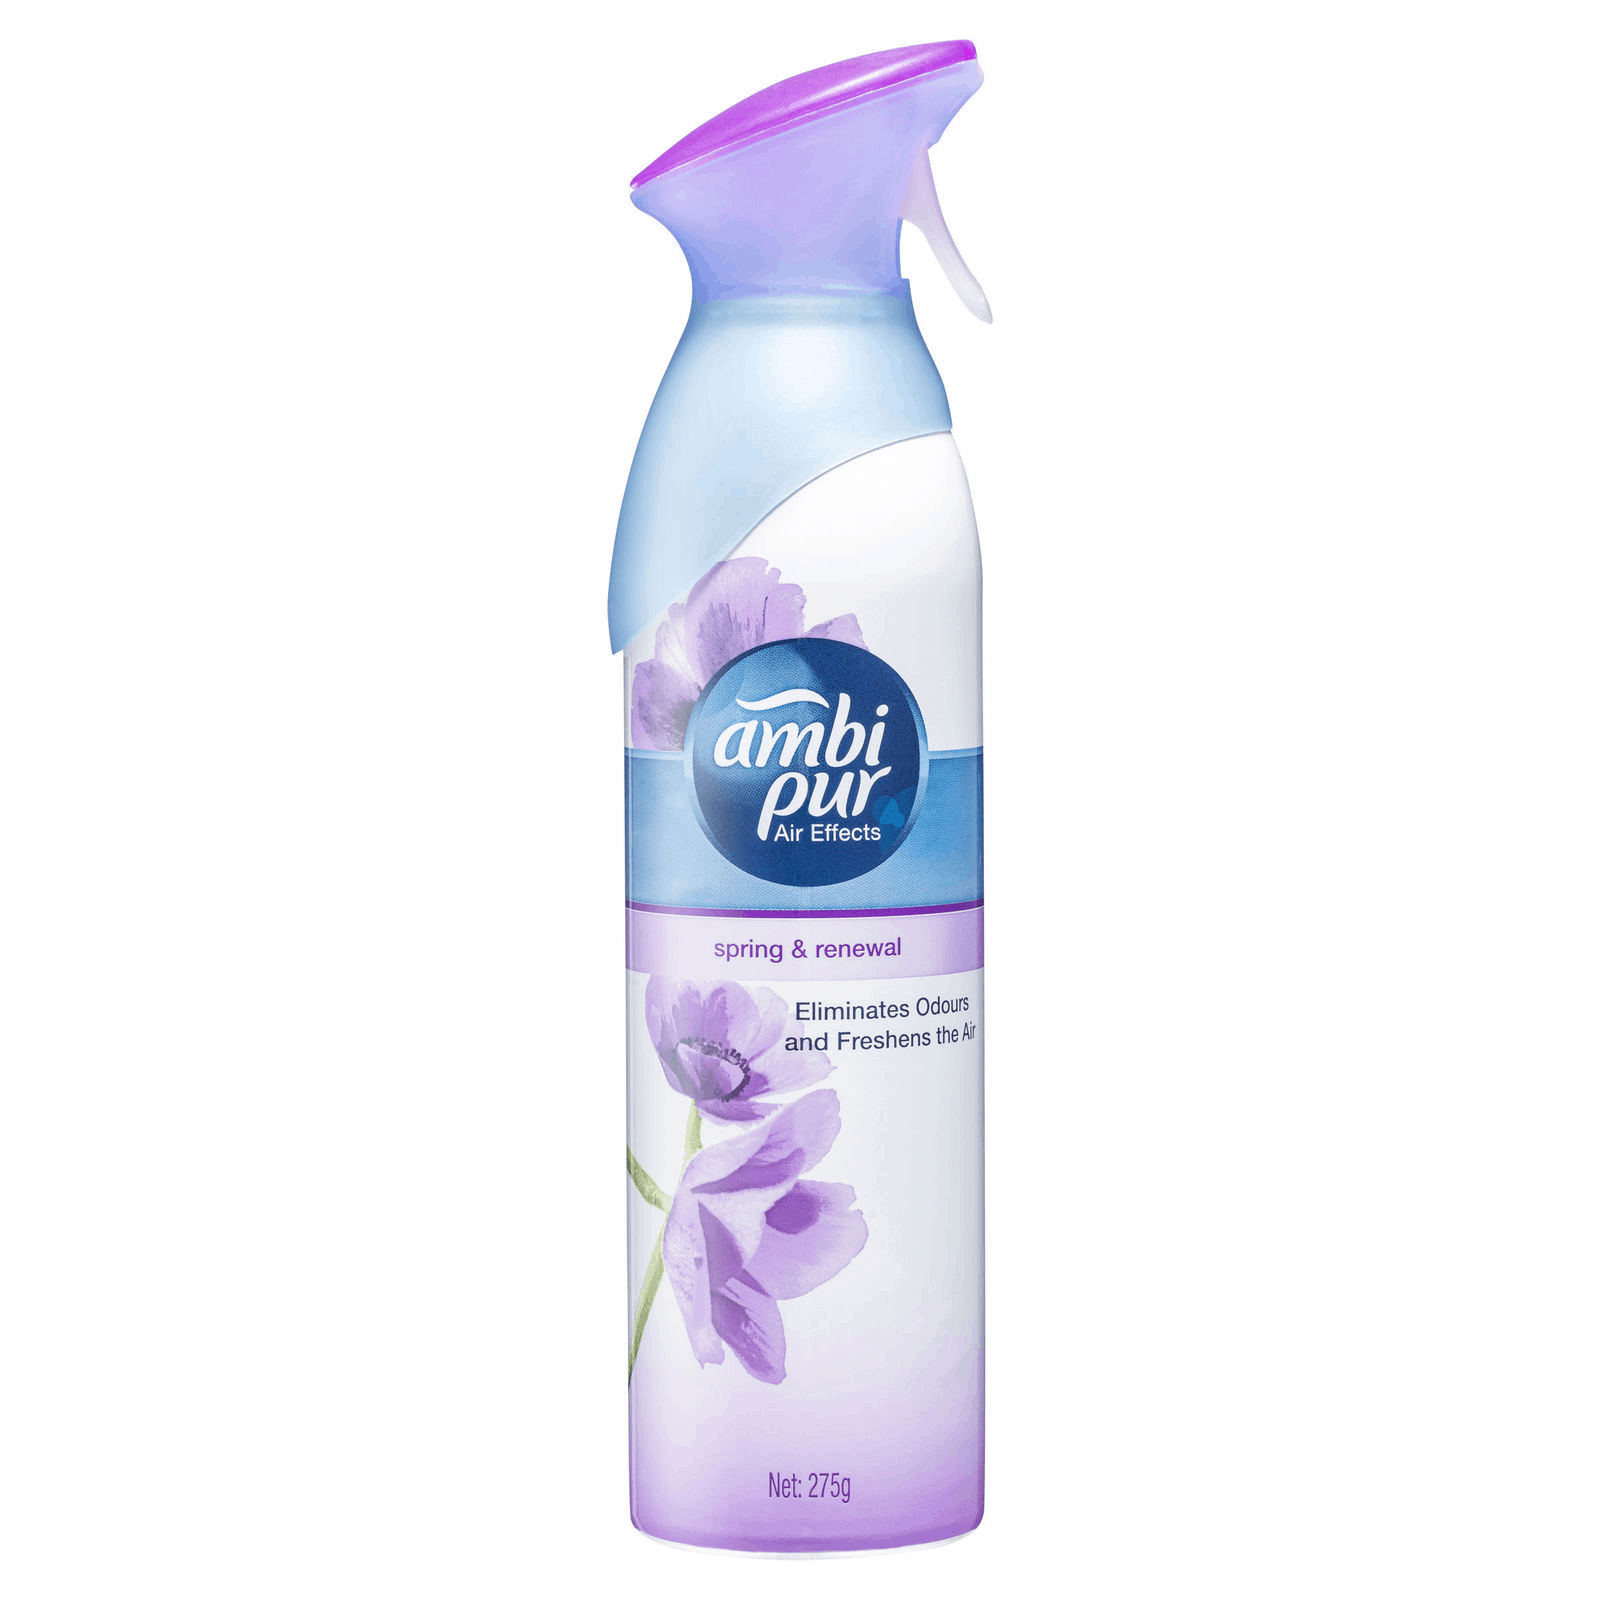 Ambi Pur Aerosol Spray Lavender Vanilla & Comfort / Spring & Renewal 275gm